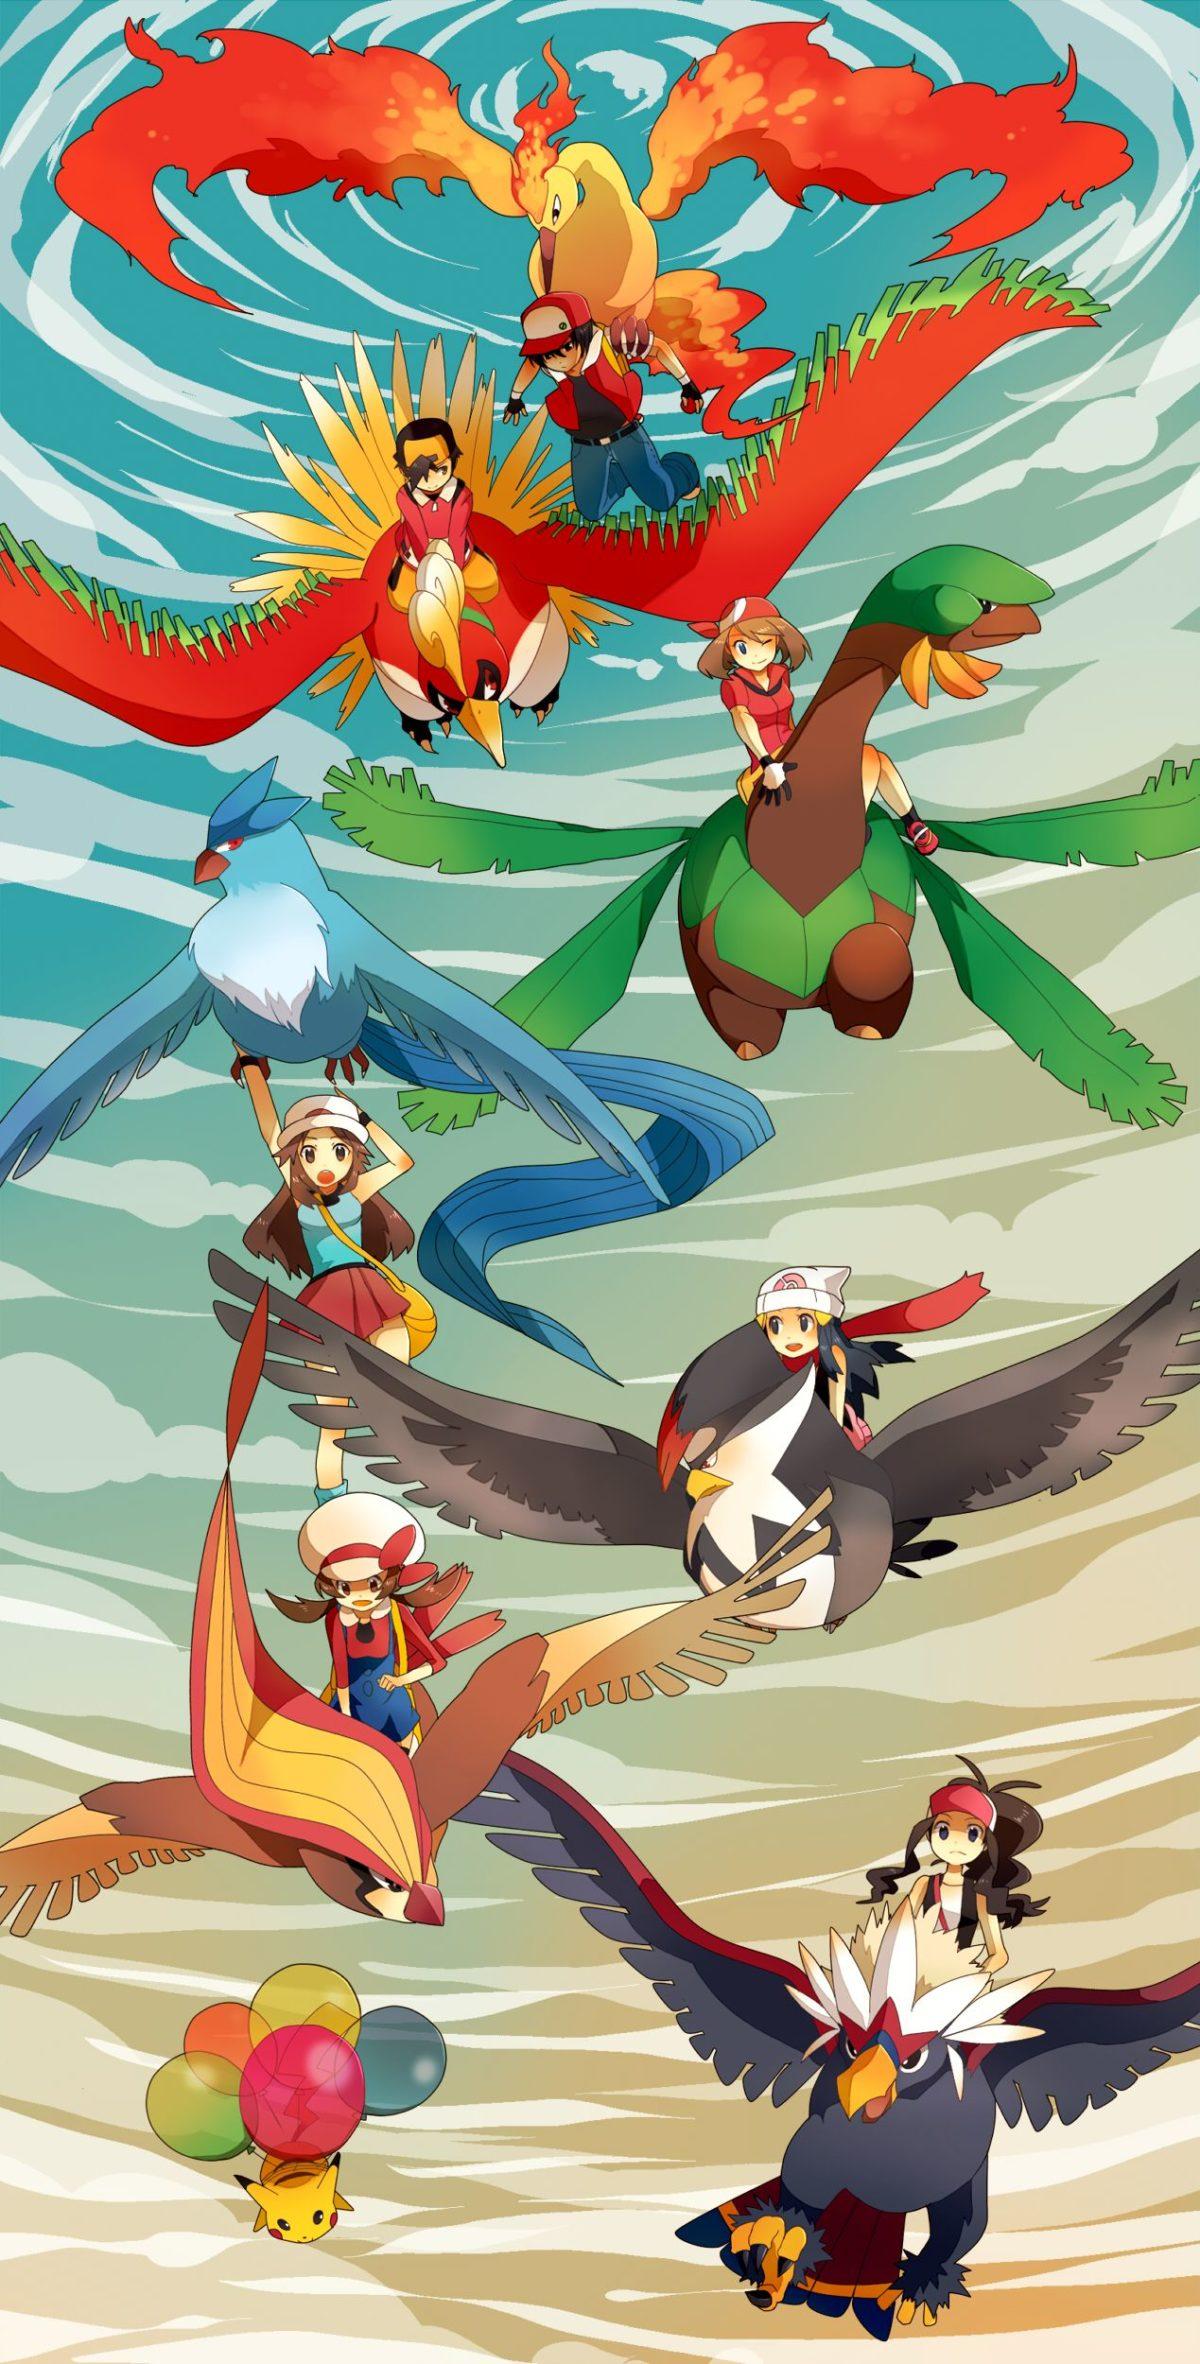 Staraptor – Pokémon – Zerochan Anime Image Board